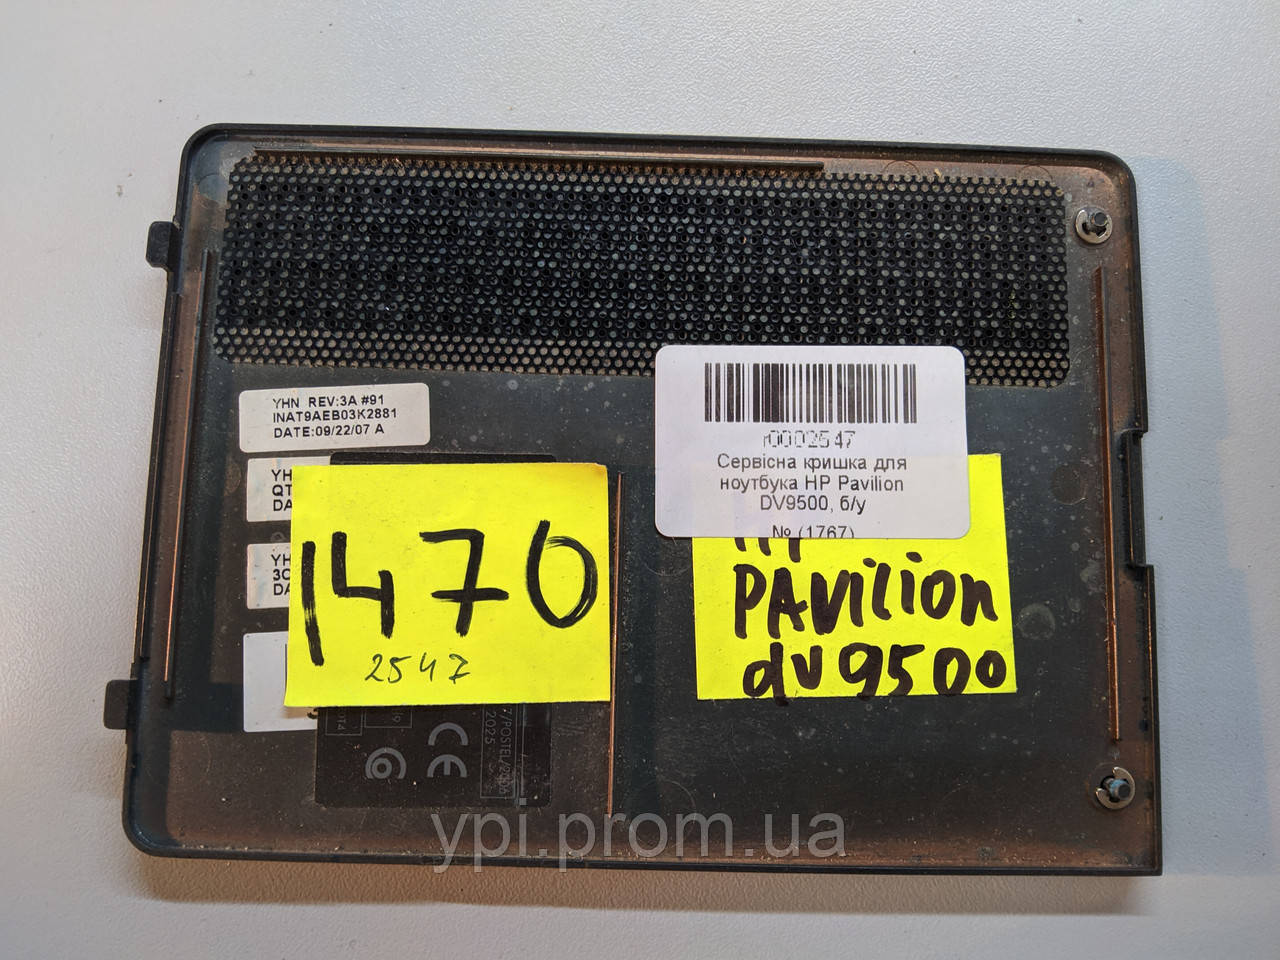 Cервисная крышка для ноутбука HP (Hewlett Packard) Pavilion DV9500